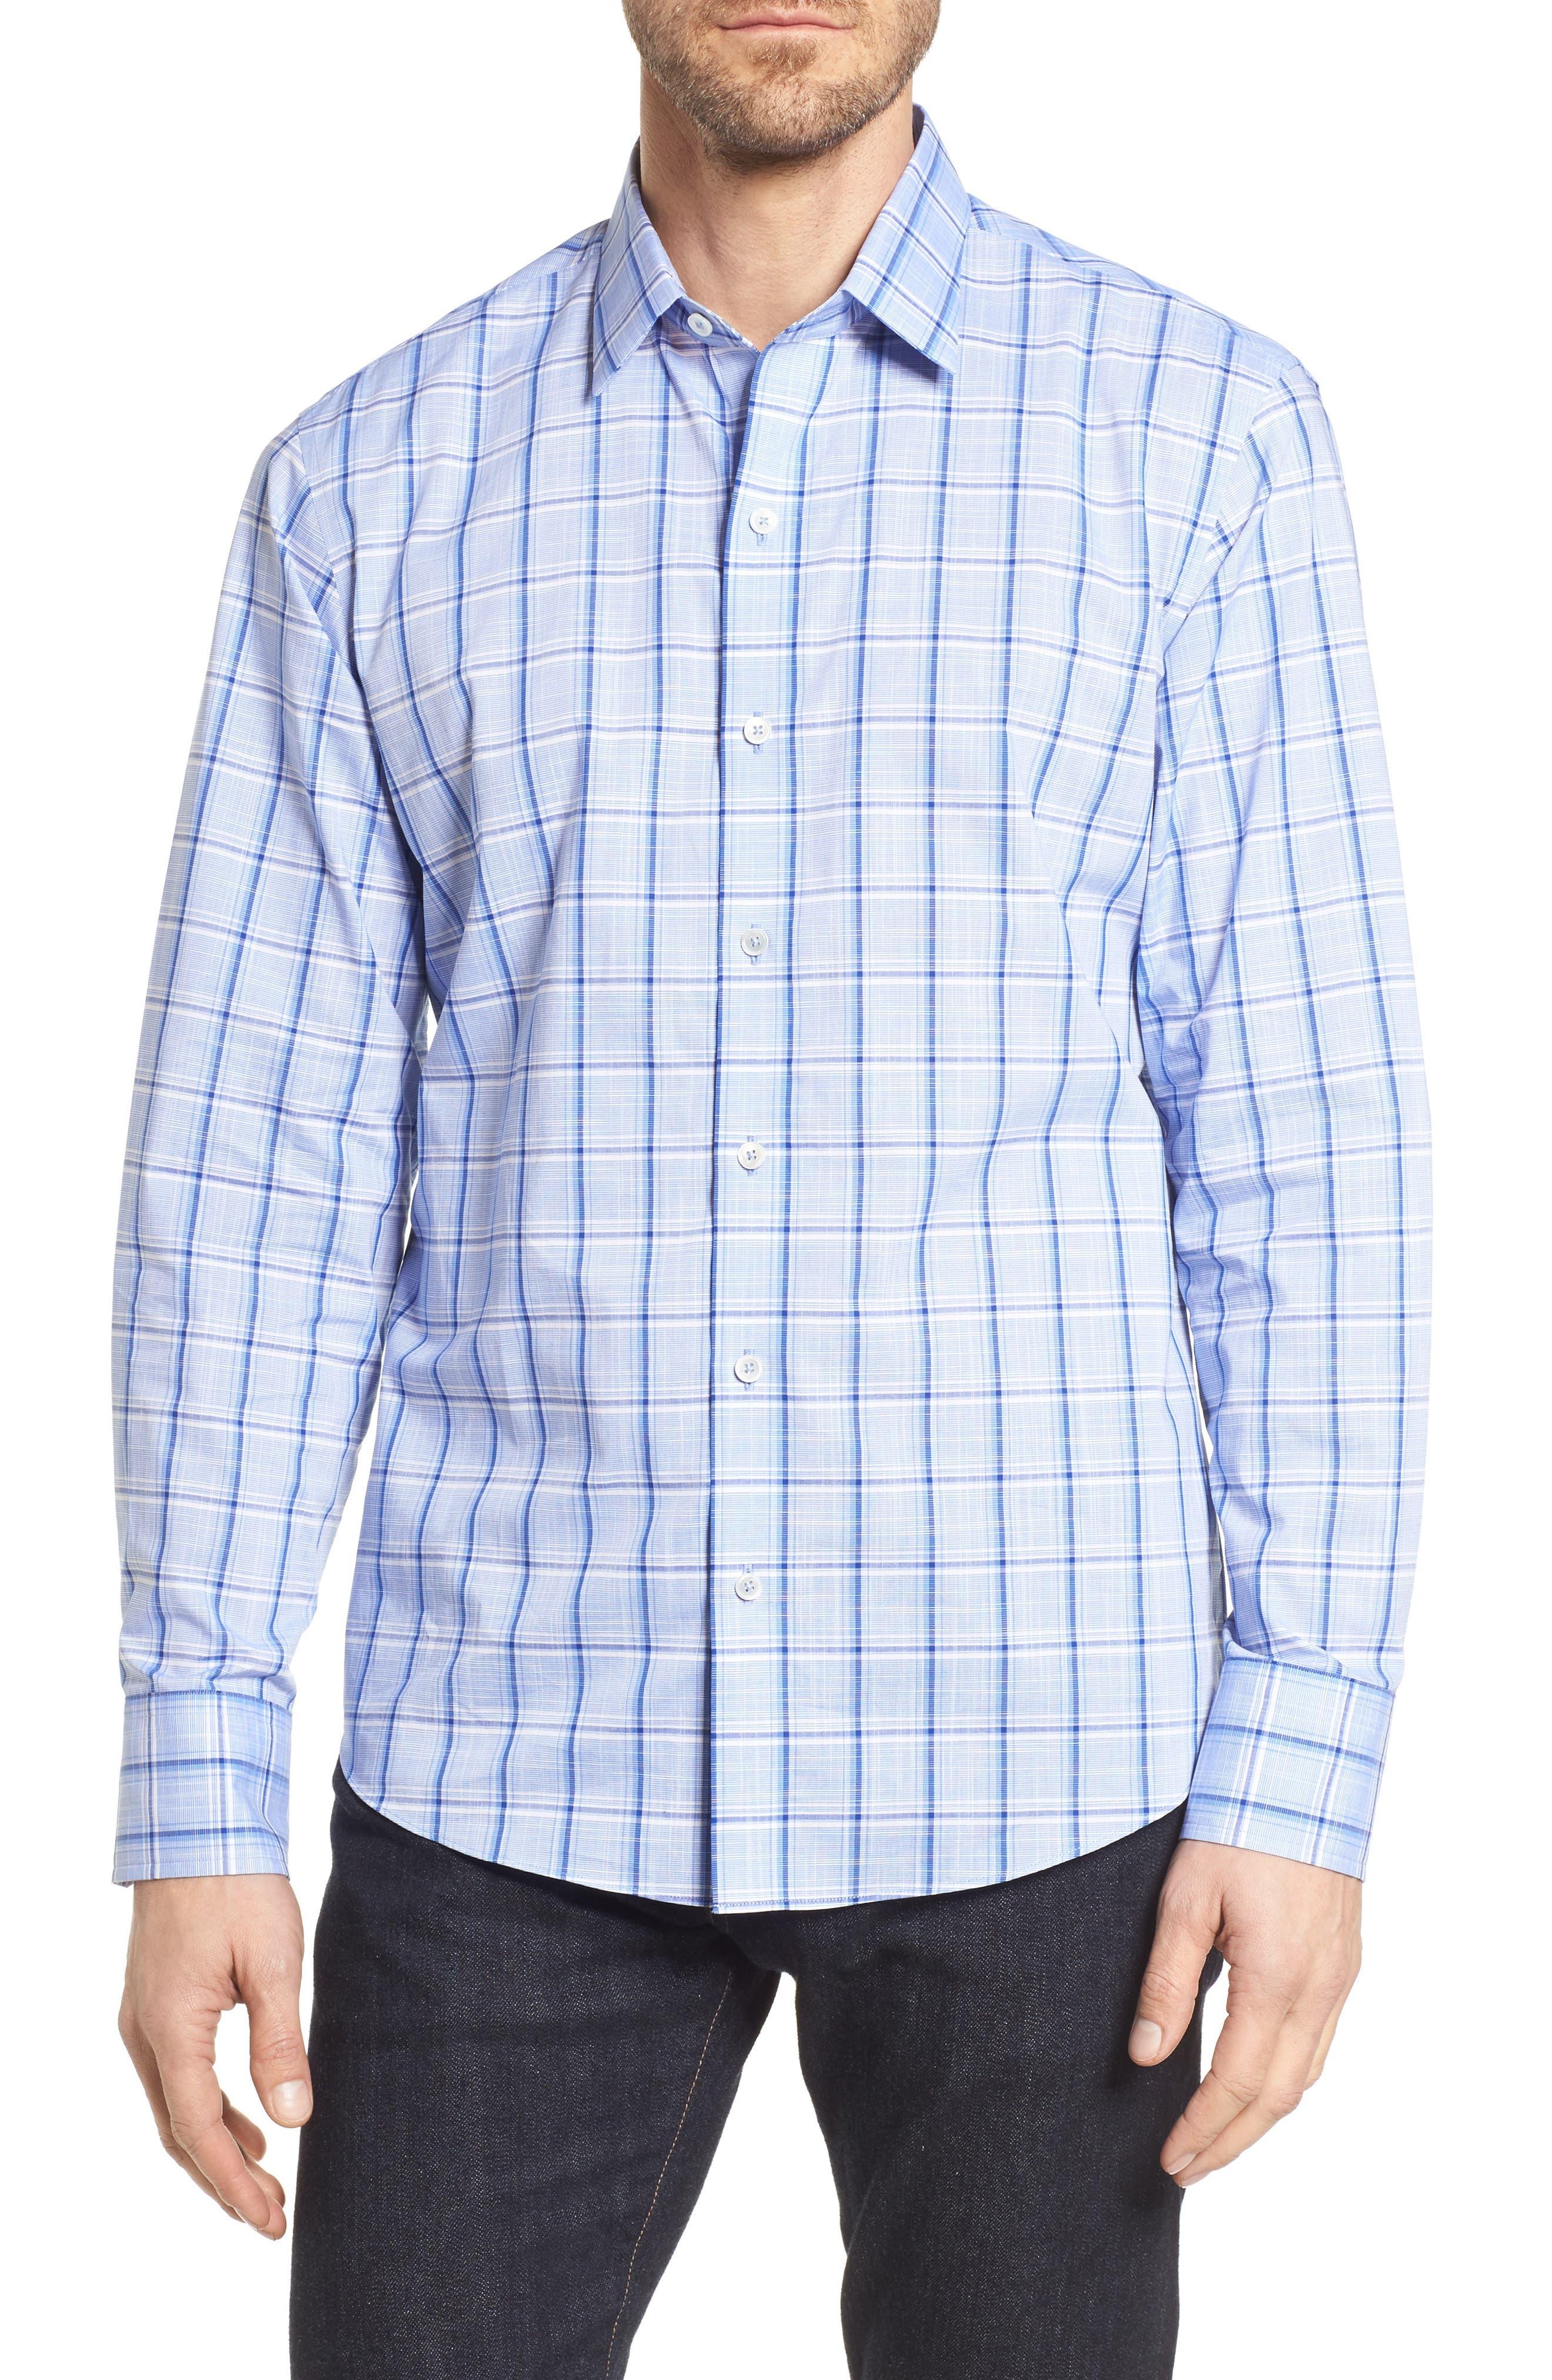 Alternate Image 1 Selected - Zachary Prell Washington Plaid Sport Shirt